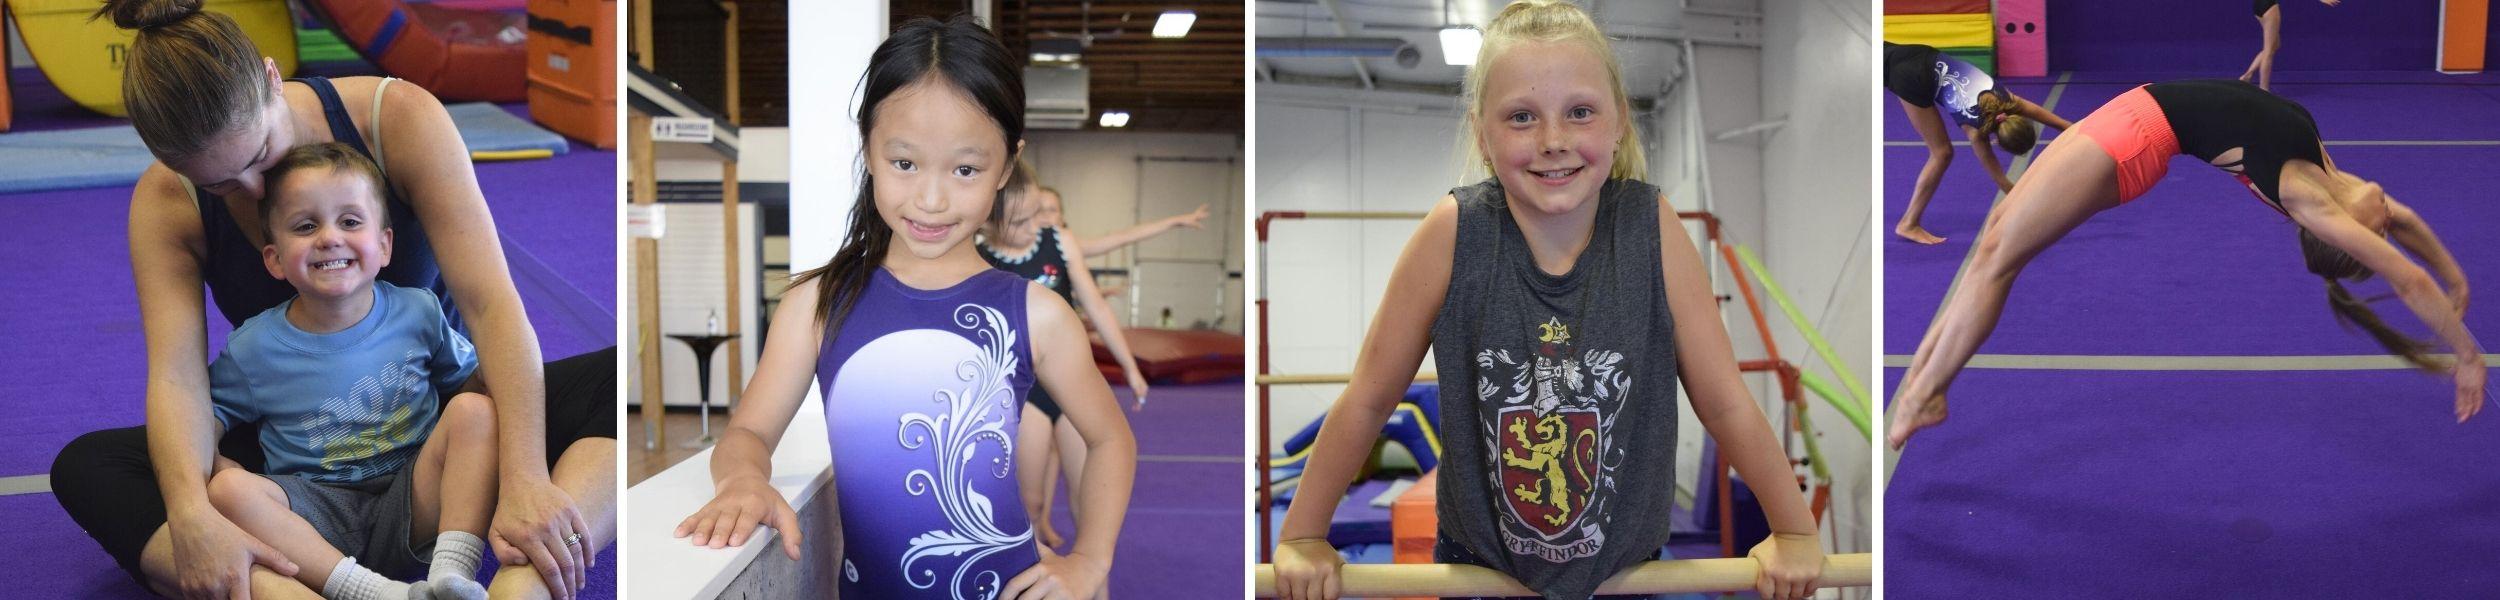 Gymnastics All Ages